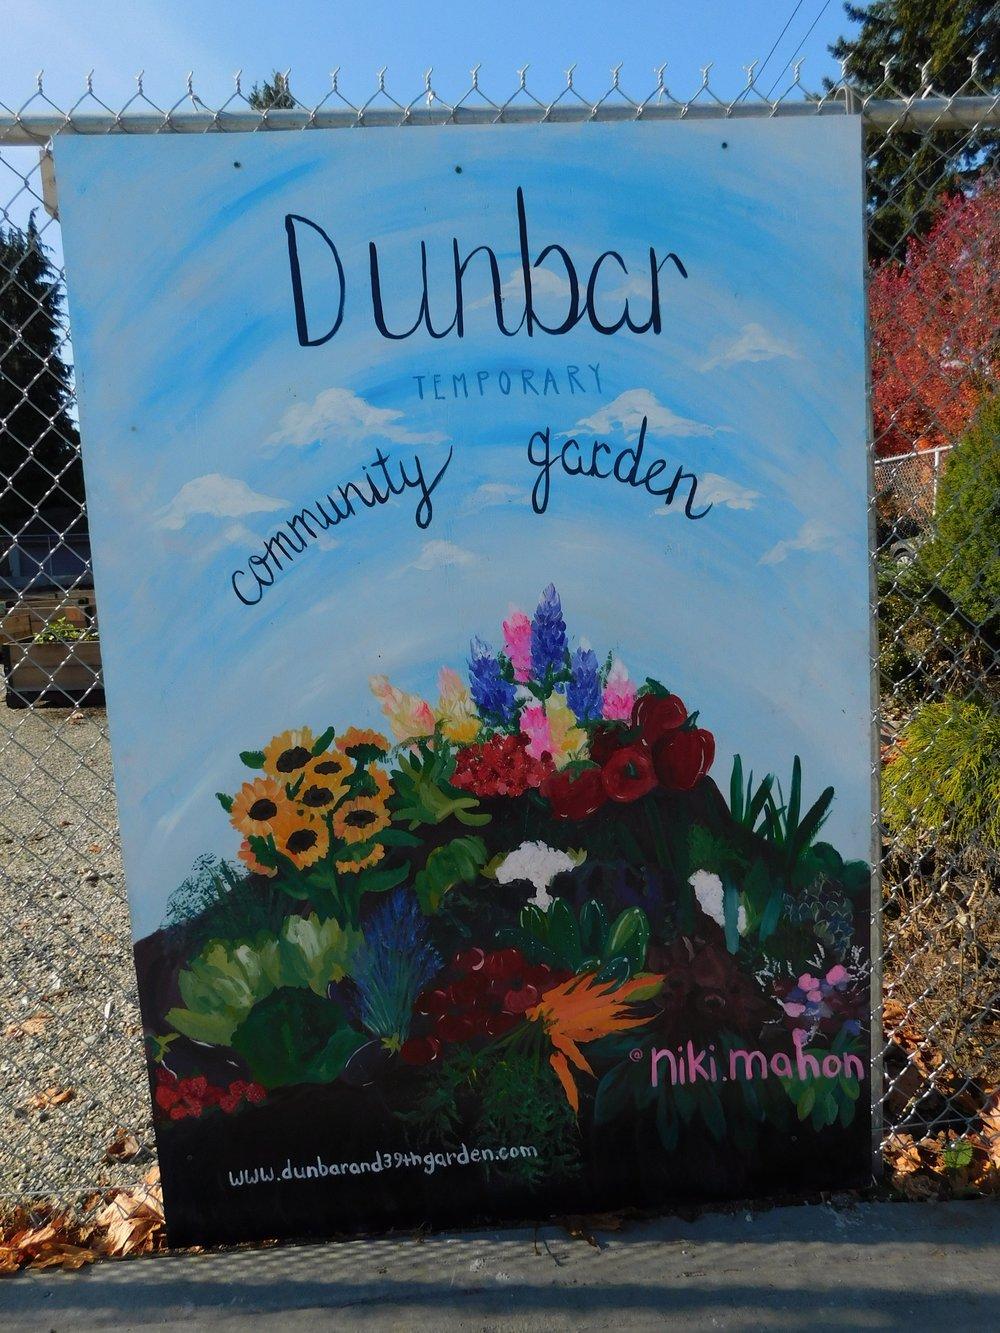 Dunbar_40th_Vancouver_Community_Garden_Builders-0019.JPG